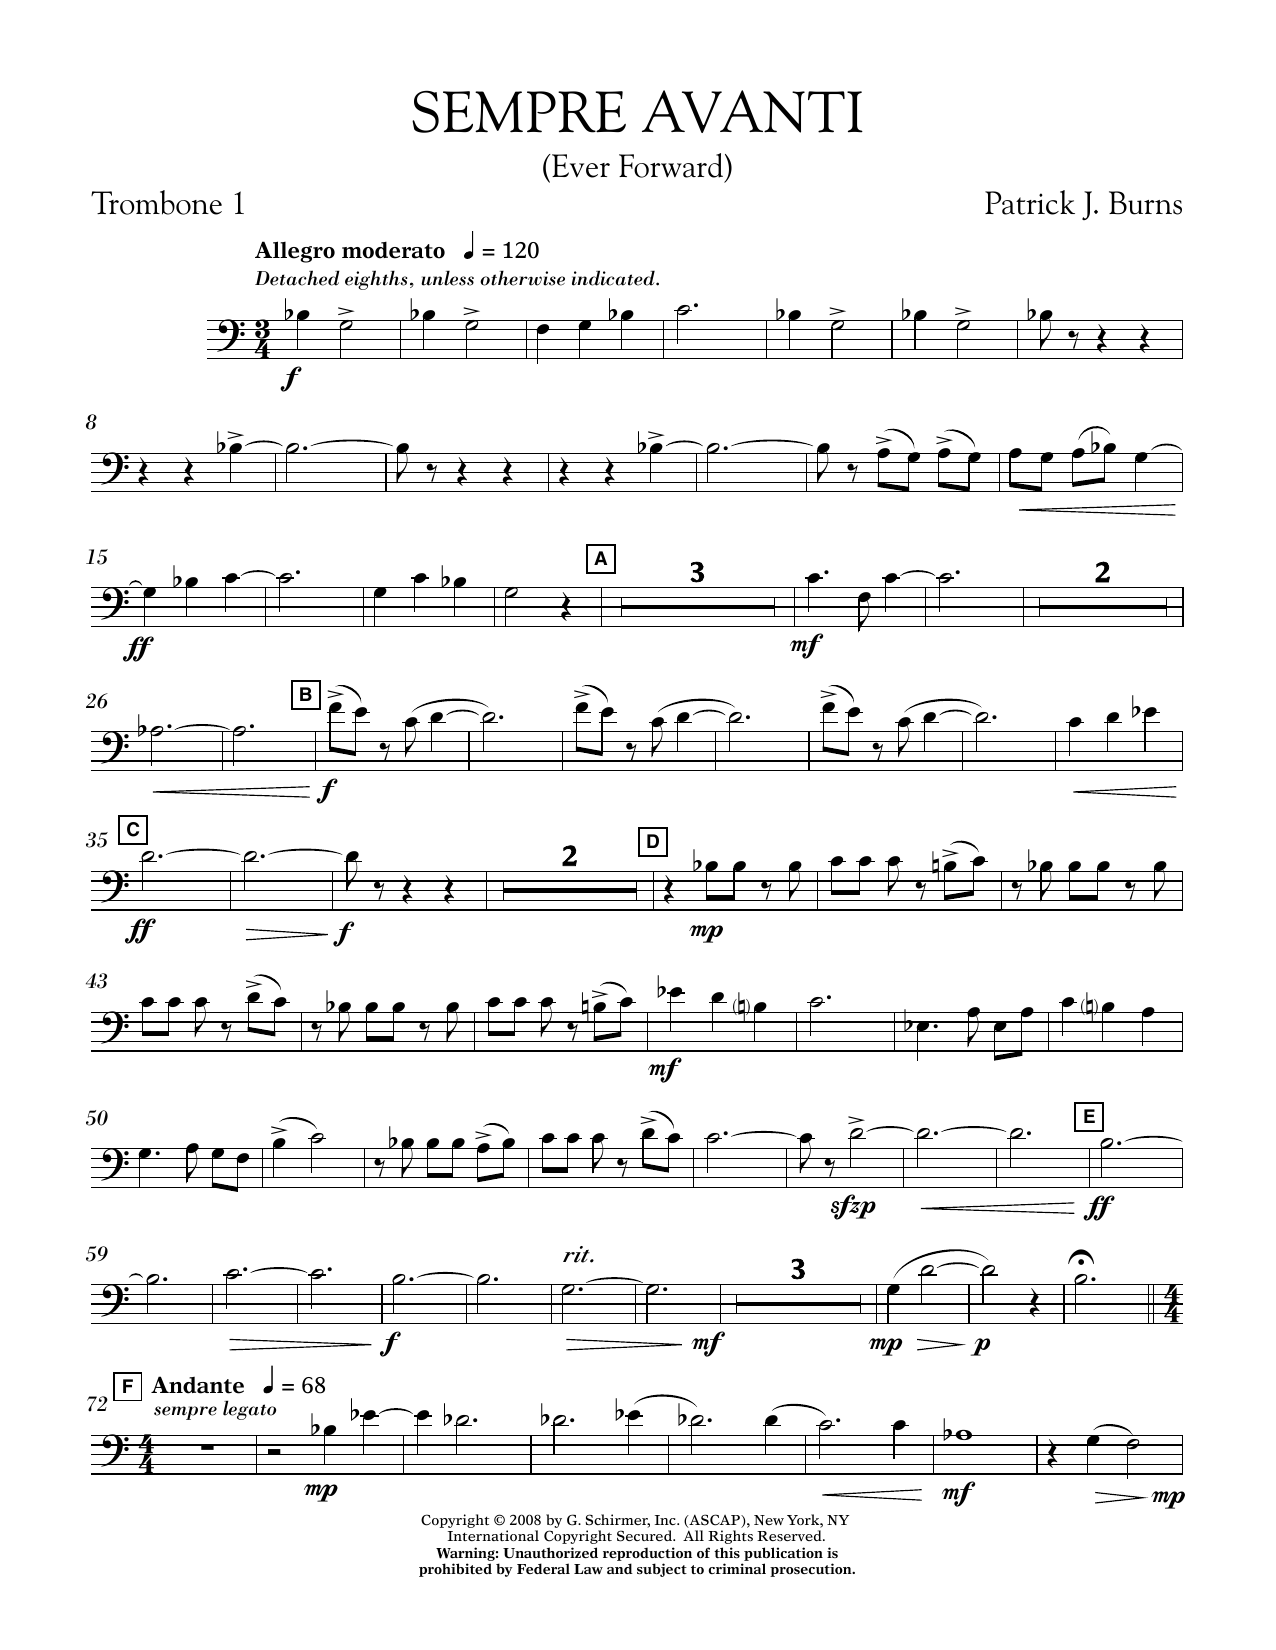 Sempre Avanti - Trombone 1